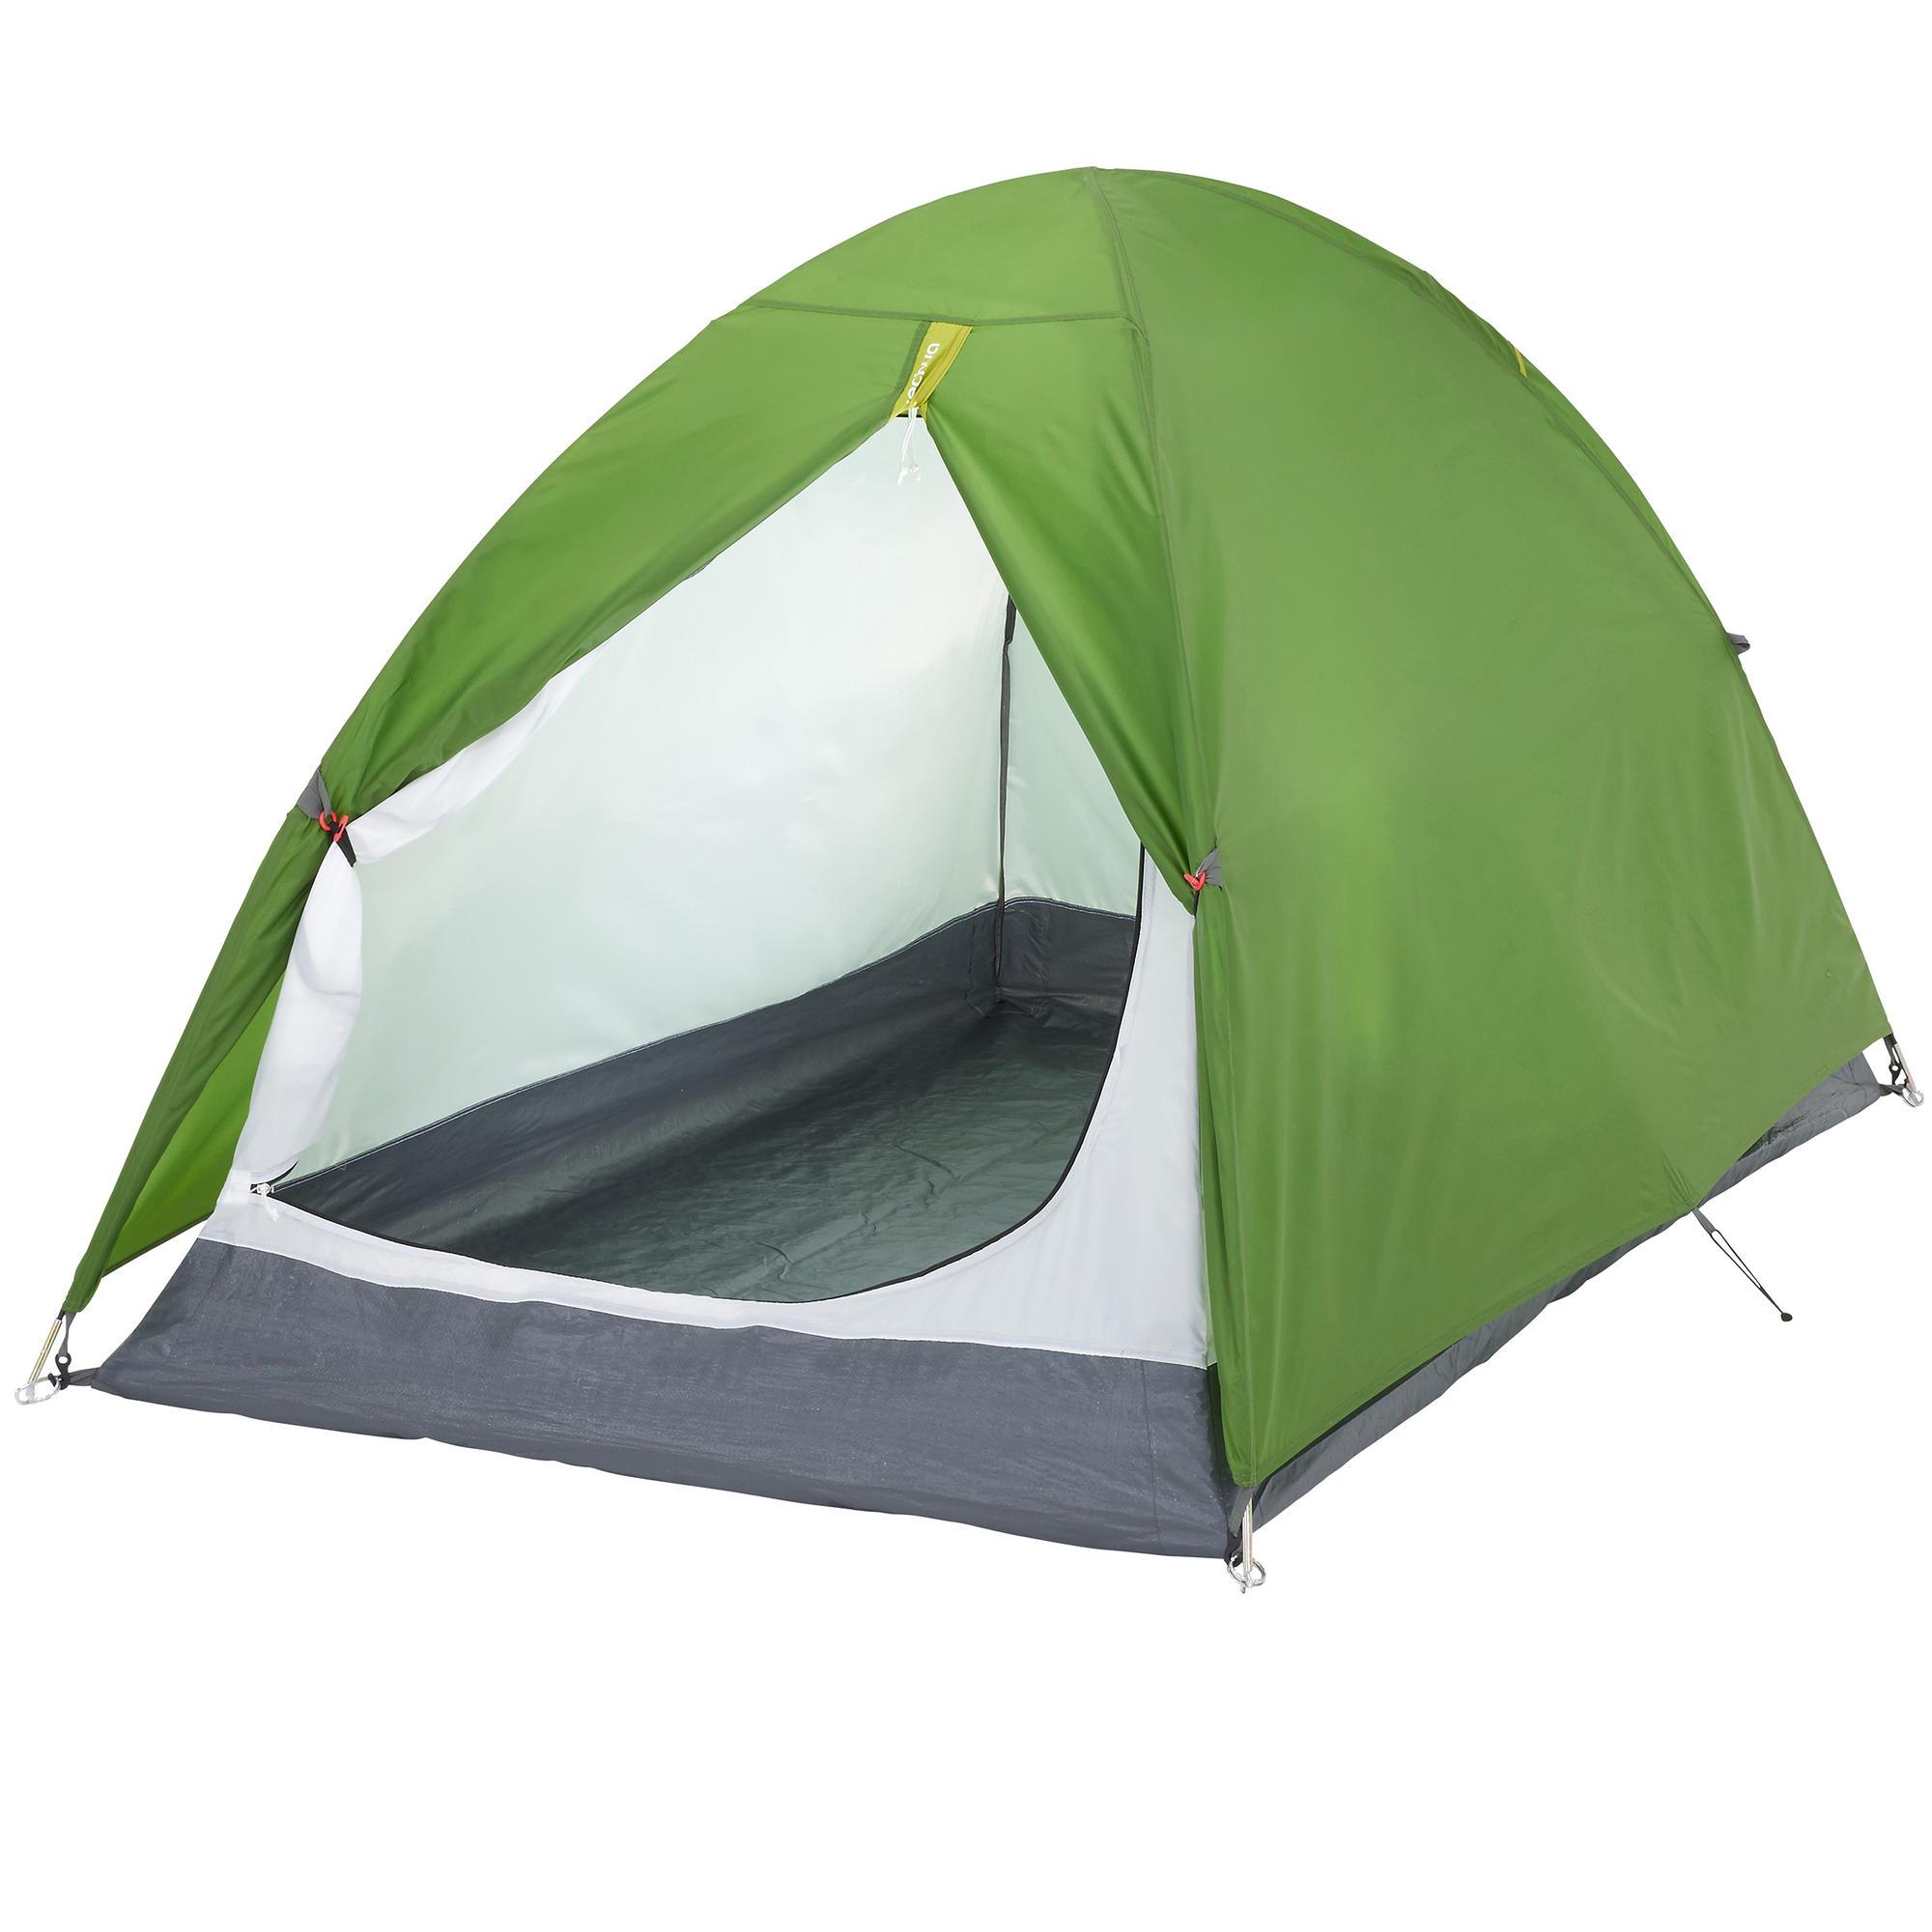 zelt f r 2 personen camping arpenaz gr n quechua. Black Bedroom Furniture Sets. Home Design Ideas